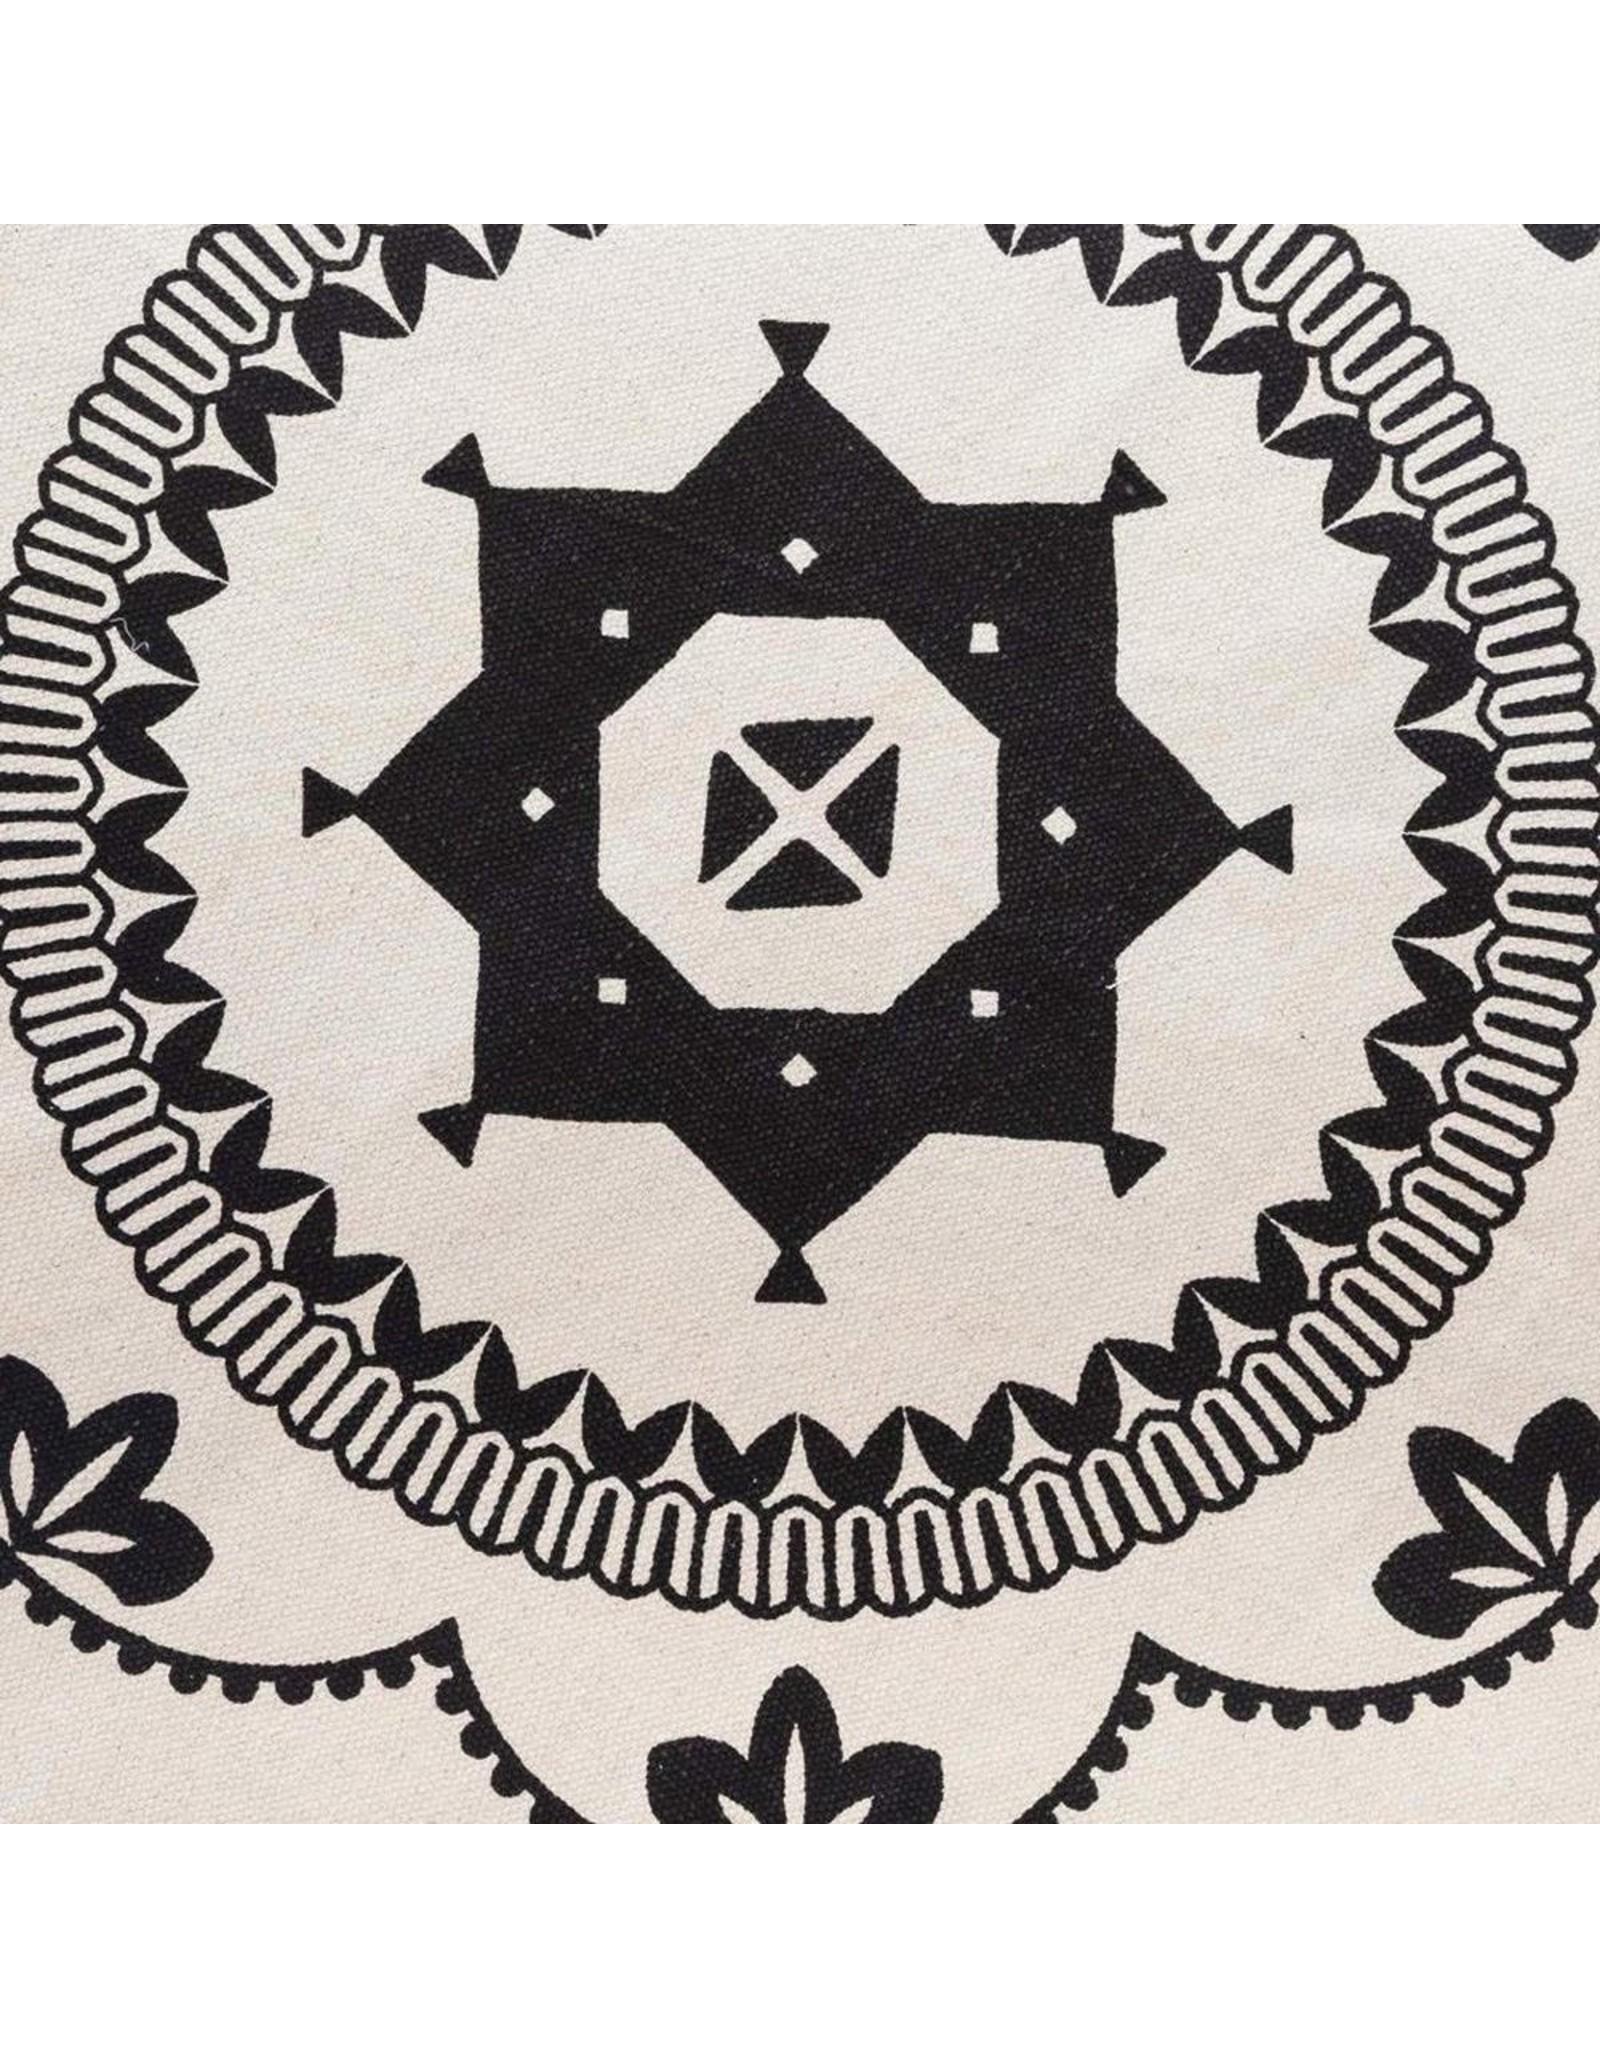 Tapijt Rond - zwart/wit - Grafische Patronen - Ø120CM